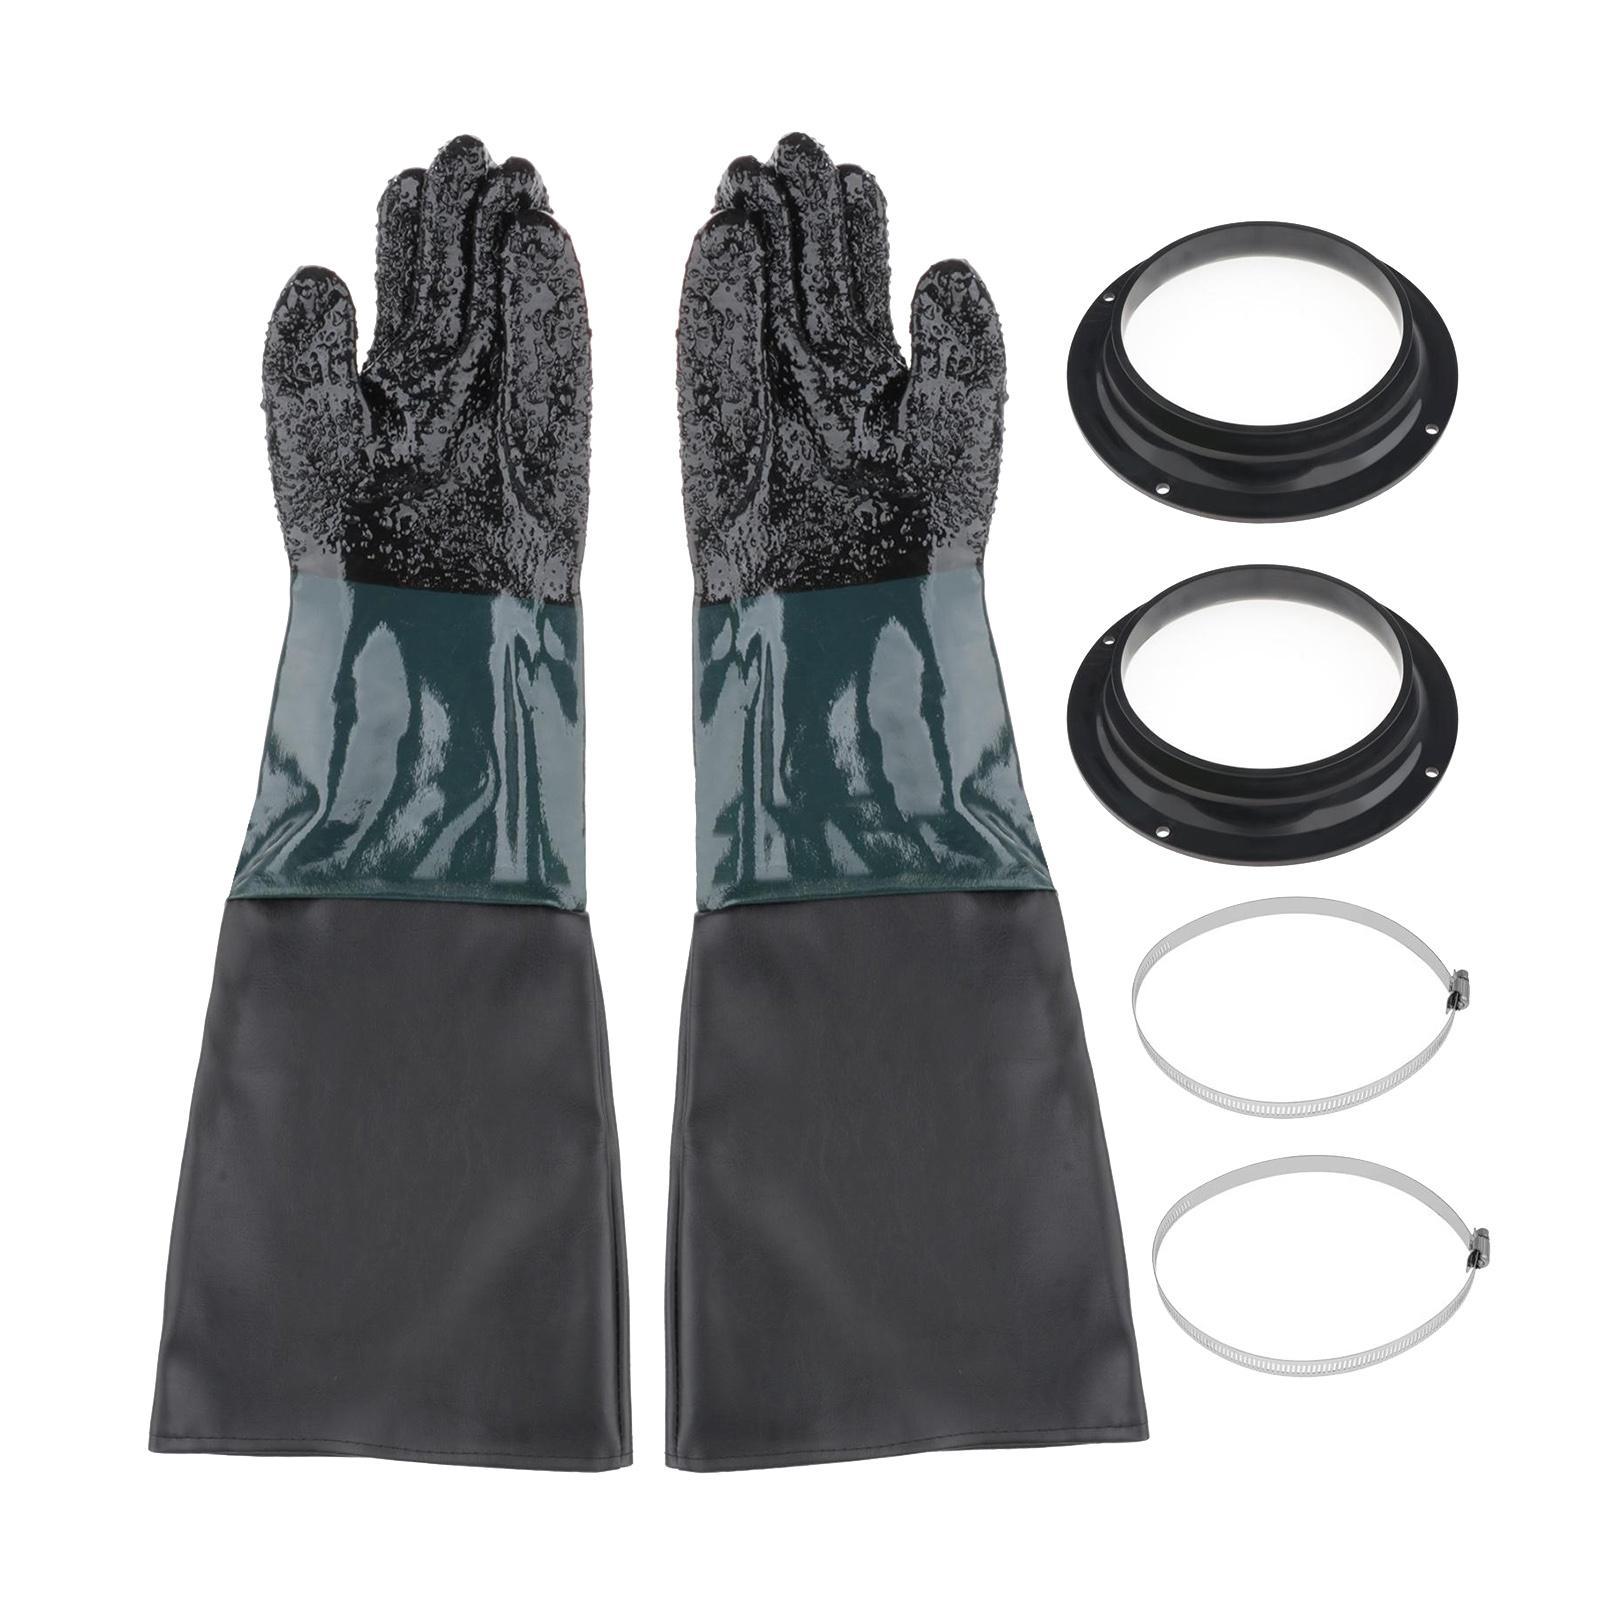 1 Pair of Heavy-duty Sandblasting Gloves for Sandblasting Sand Blast Cabinet